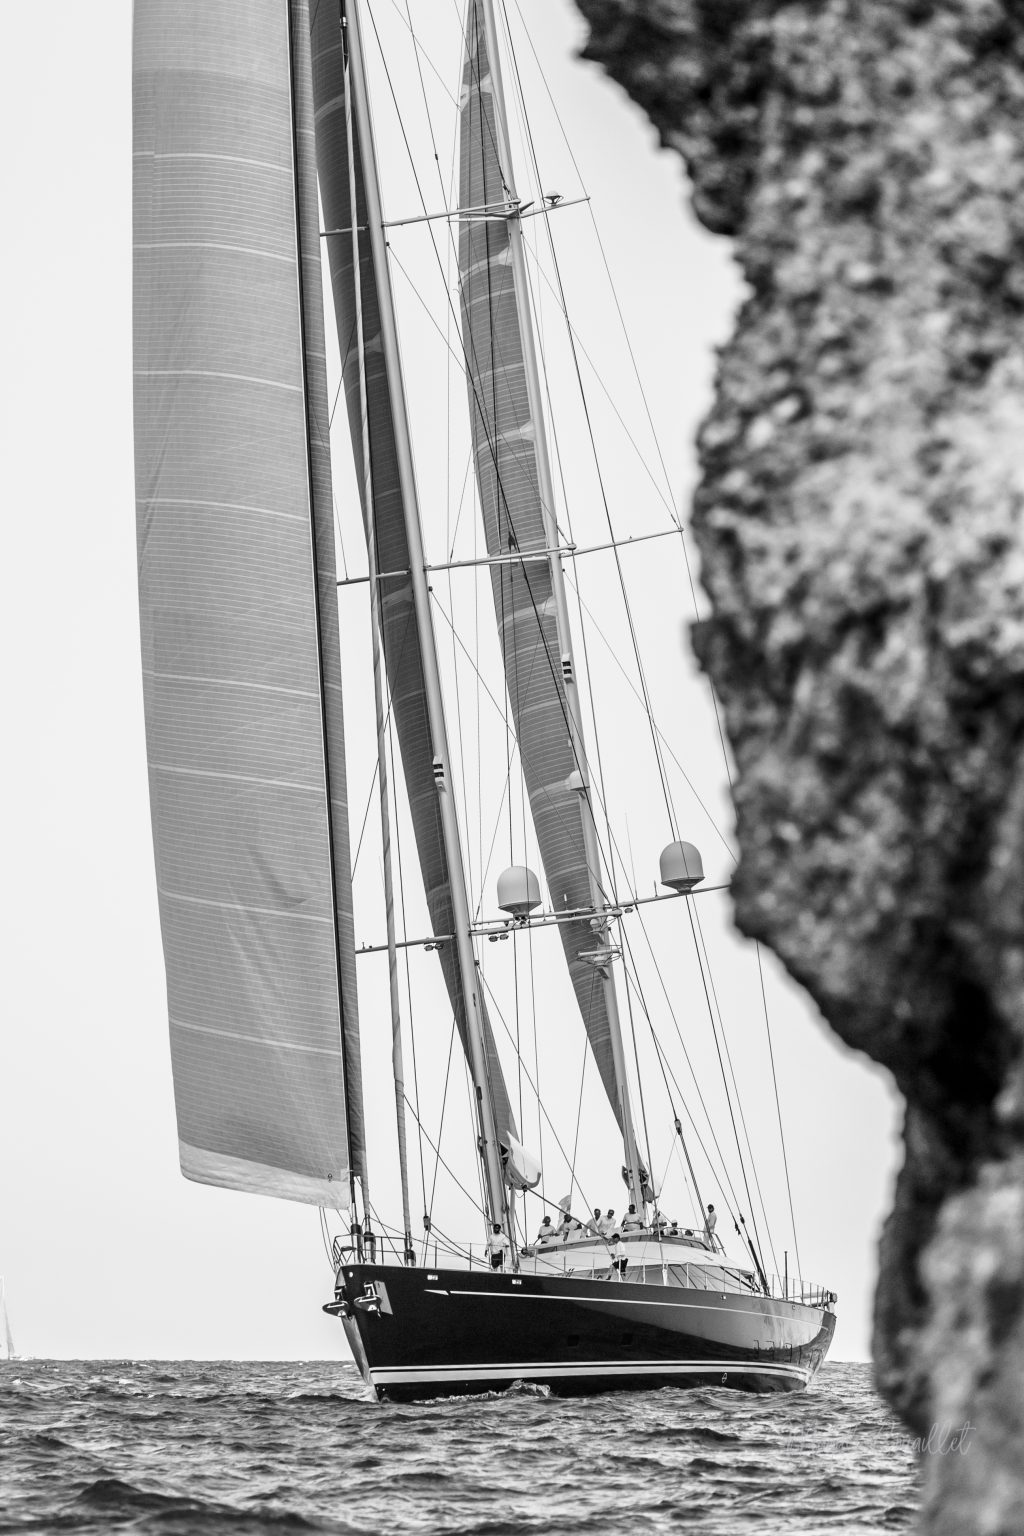 Sail Yacht, Bucket Regatta 2019 St Barths